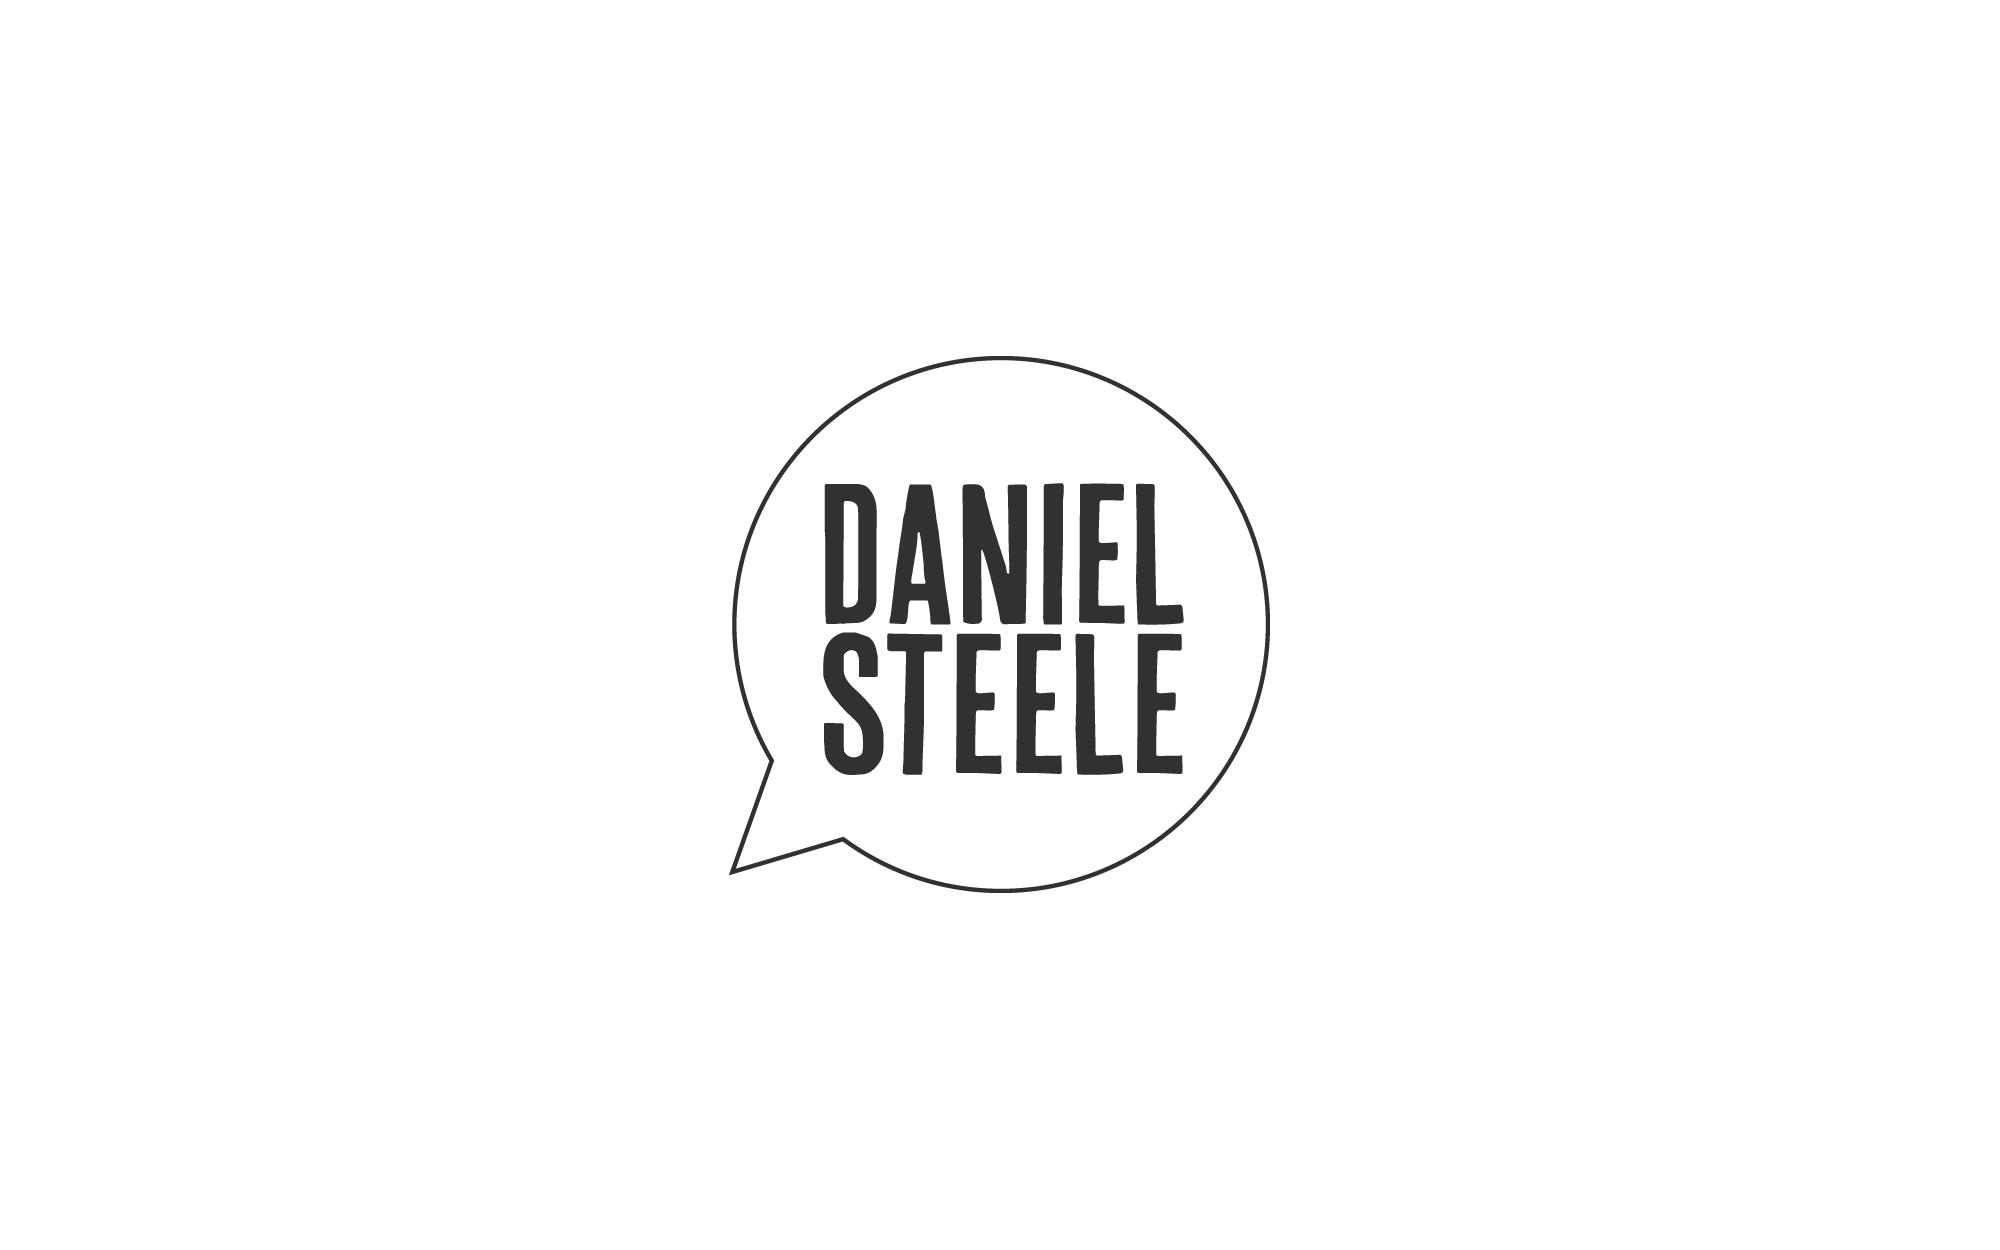 daniel_steele_logo_matthew_pomorski_graphic_designer_kent